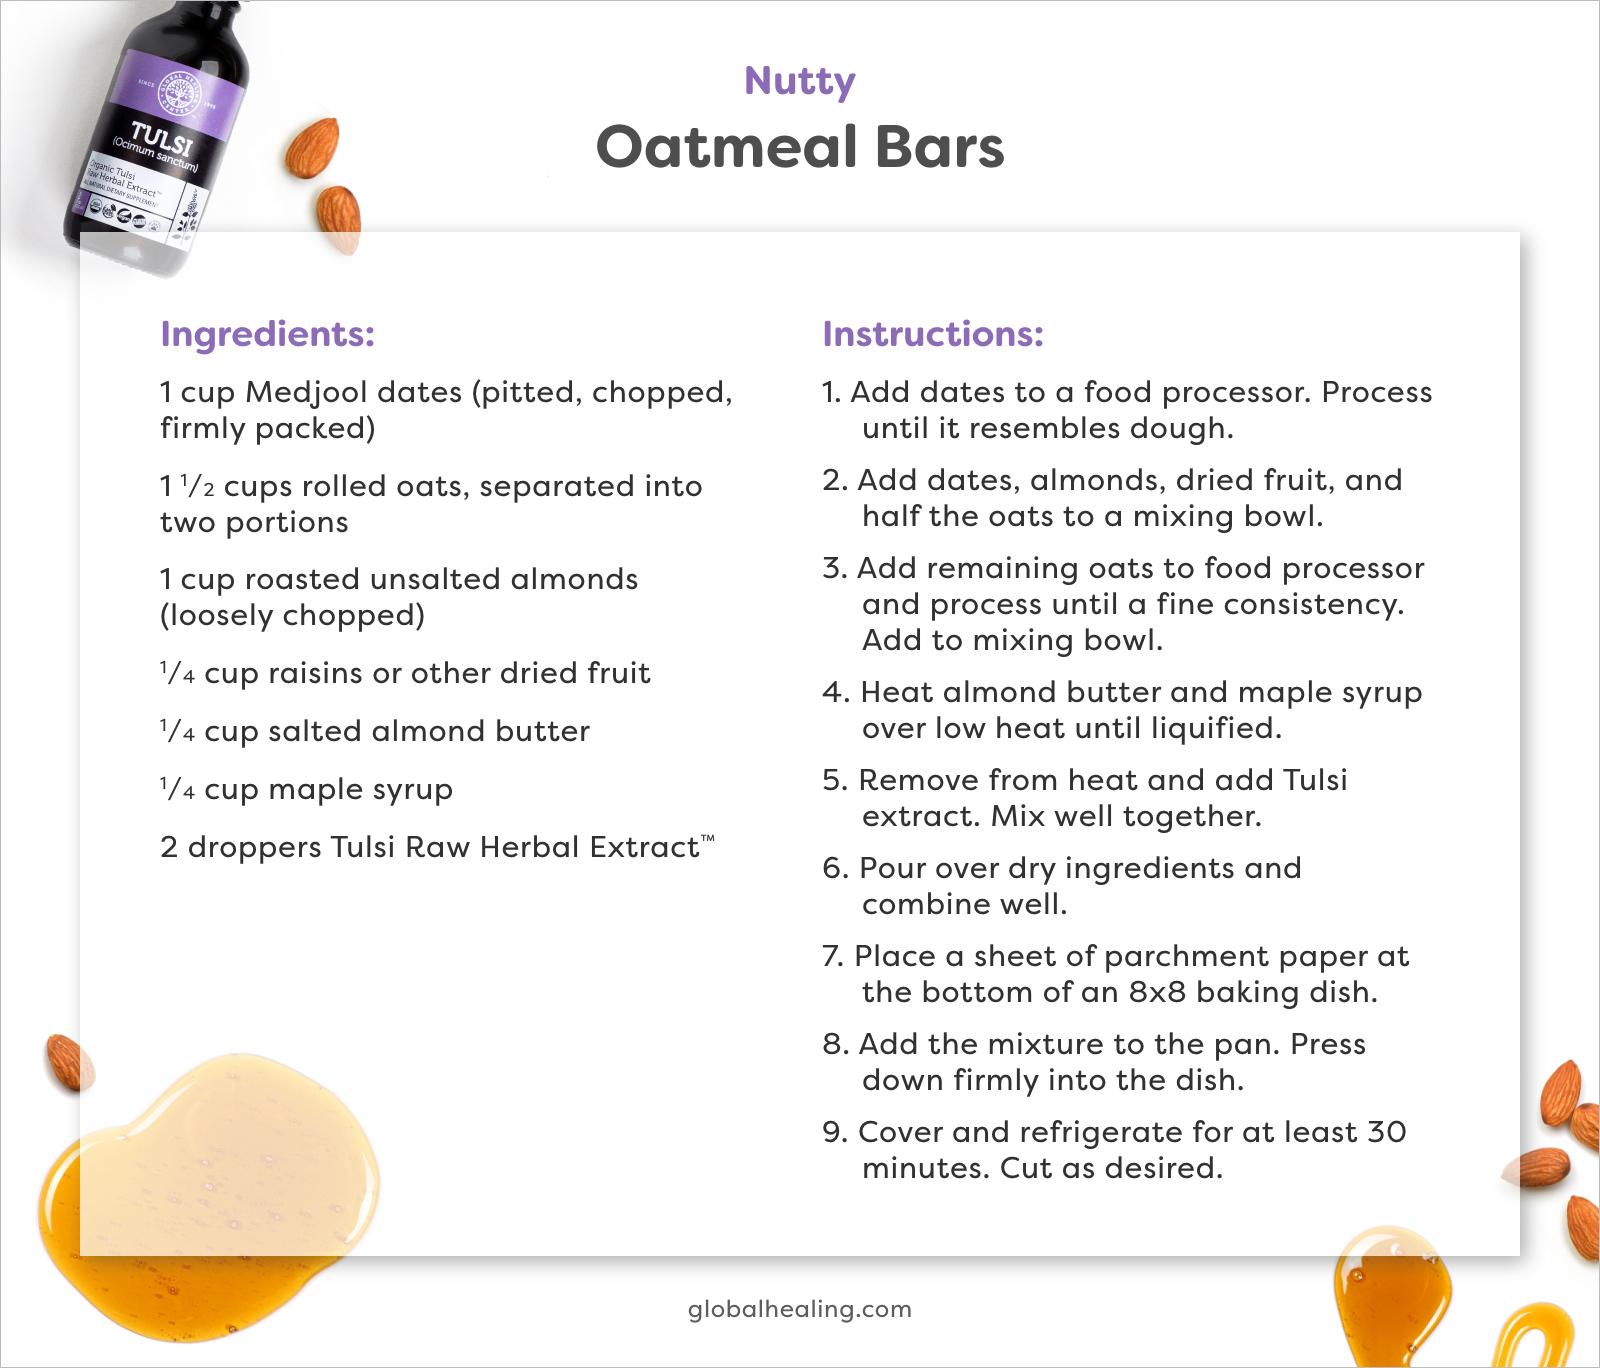 Nutty Oatmeal Bars recipe cards.